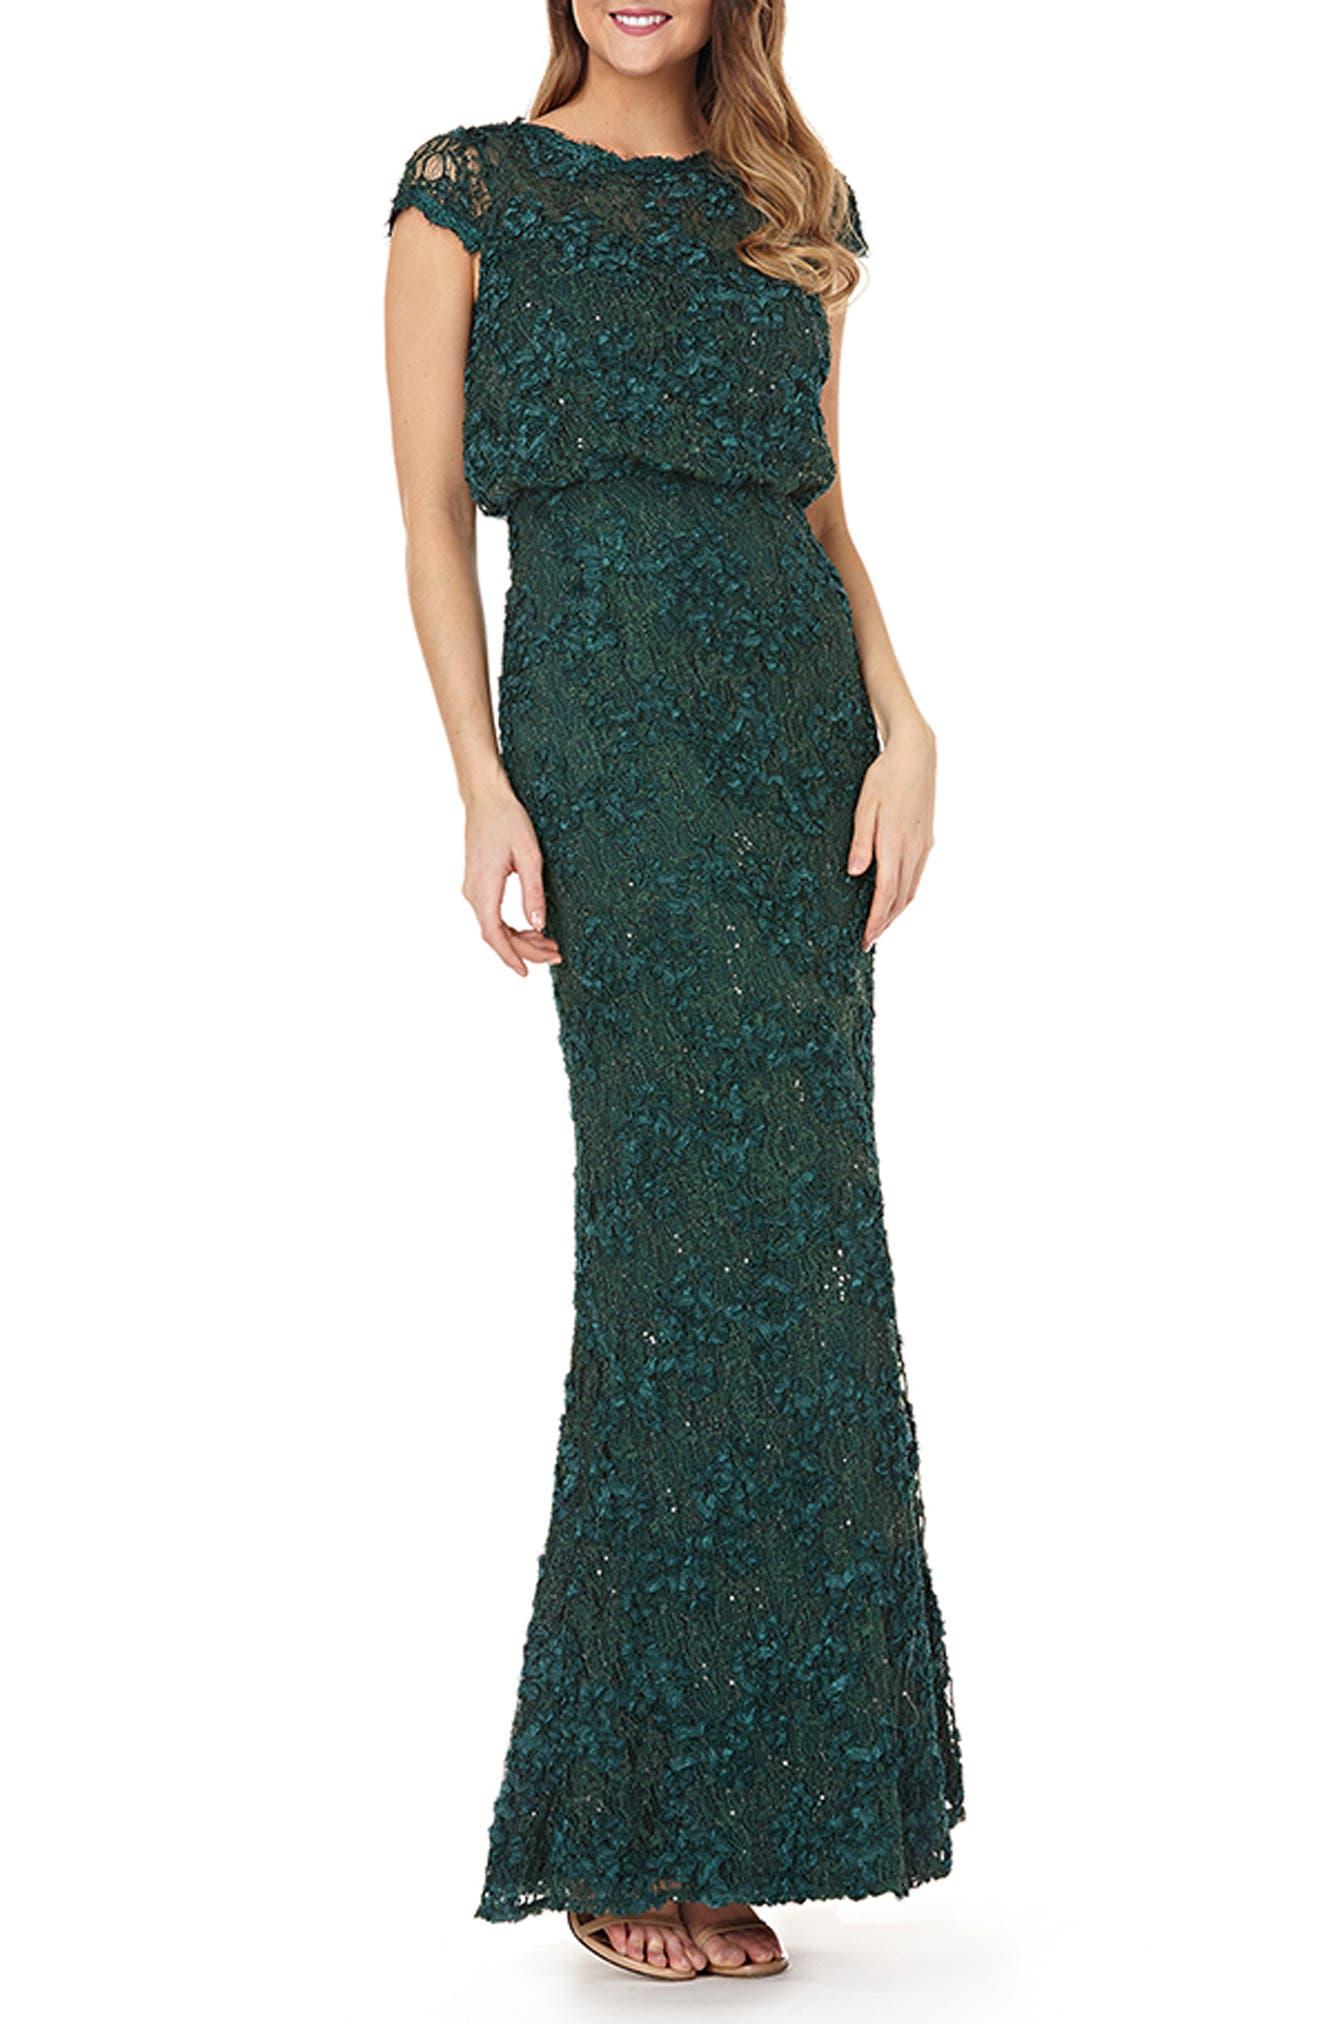 JS COLLECTIONS Sequin Lace Blouson Gown, Main, color, GREEN